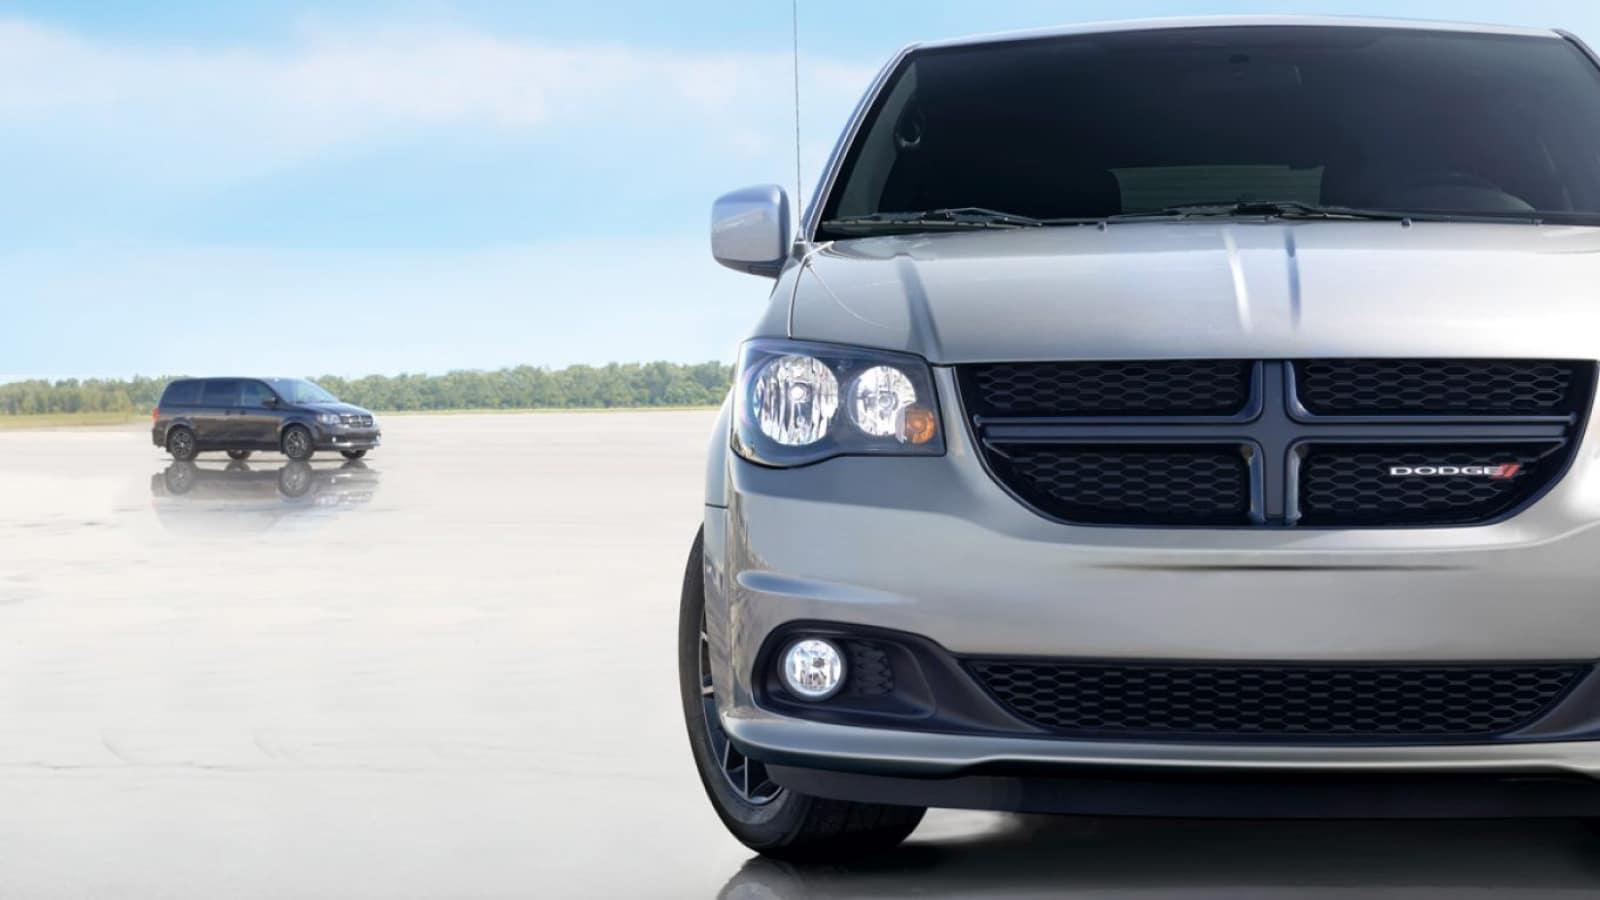 Get your vehicle serviced at Mancari CDJR near Burr Ridge, IL